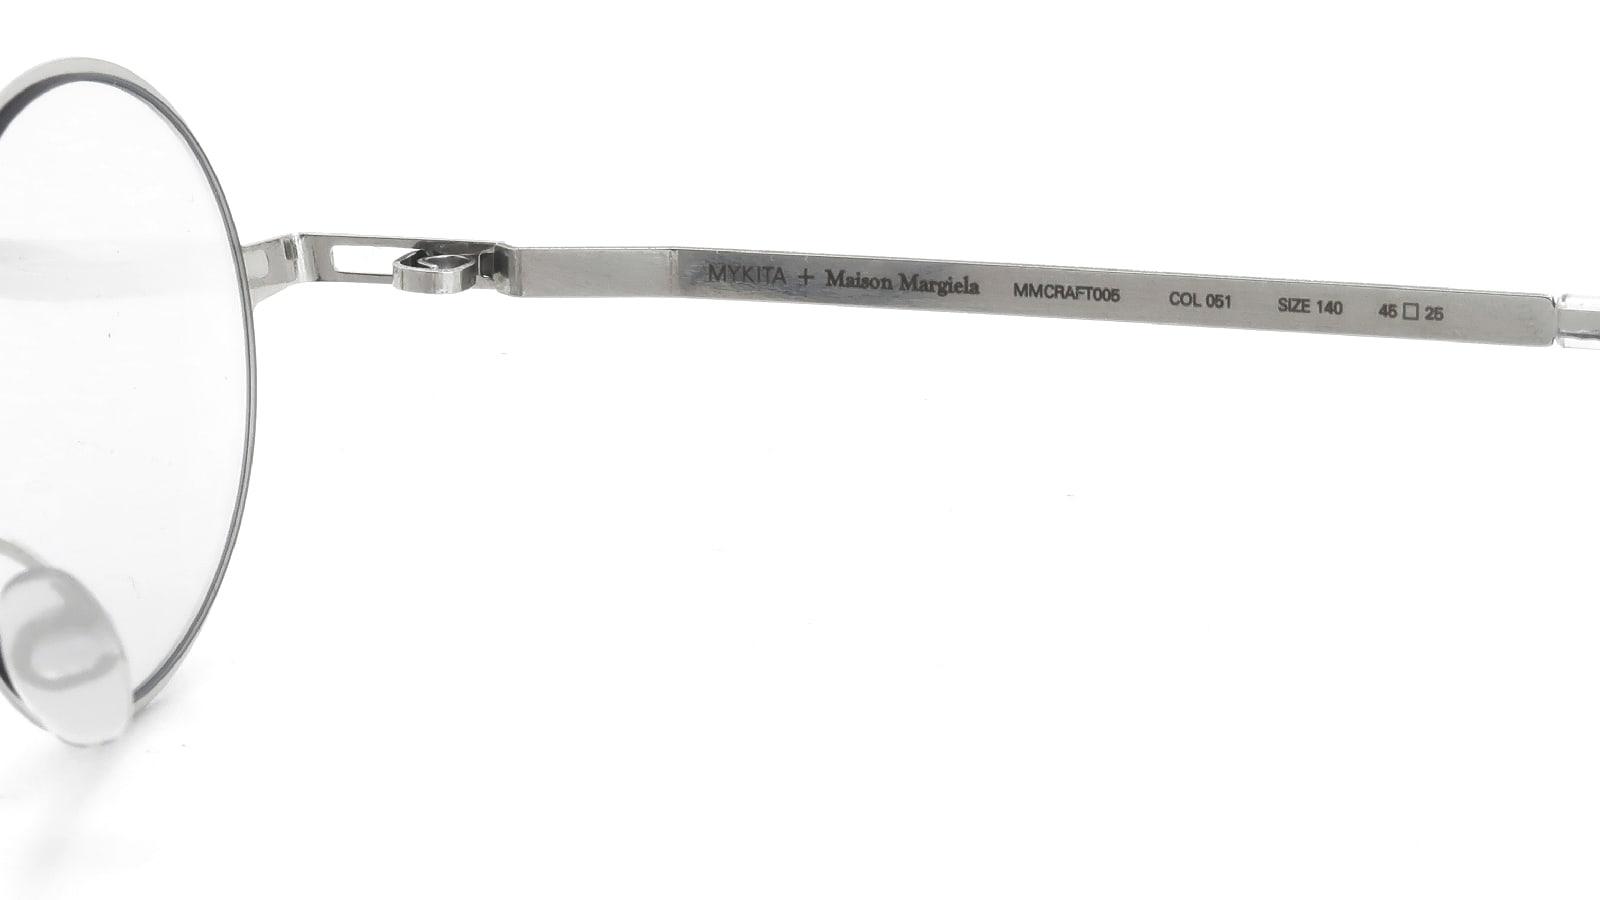 MYKITA + Maison Margiela MMCRAFT005 COL.051 Shiny Silver 10